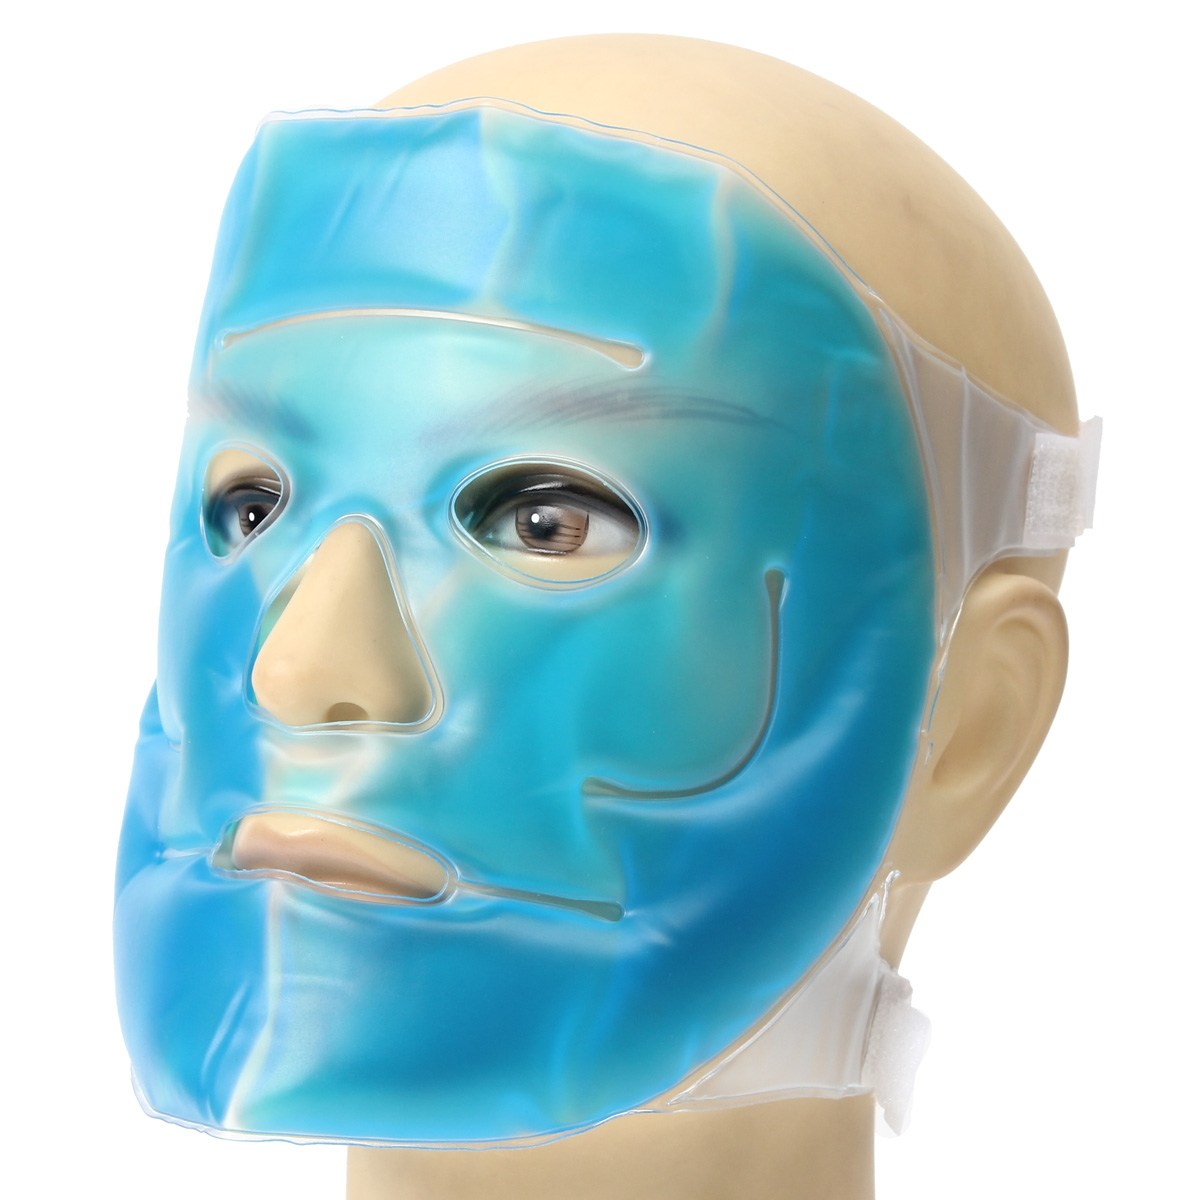 Audace 1 Pz Gel Freddo Maschera Impacco Di Ghiaccio Blu Full Face Raffreddamento Maschera Fatica Relief Rilassamento Cura Pad Con Impacco Freddo Faical Strumento